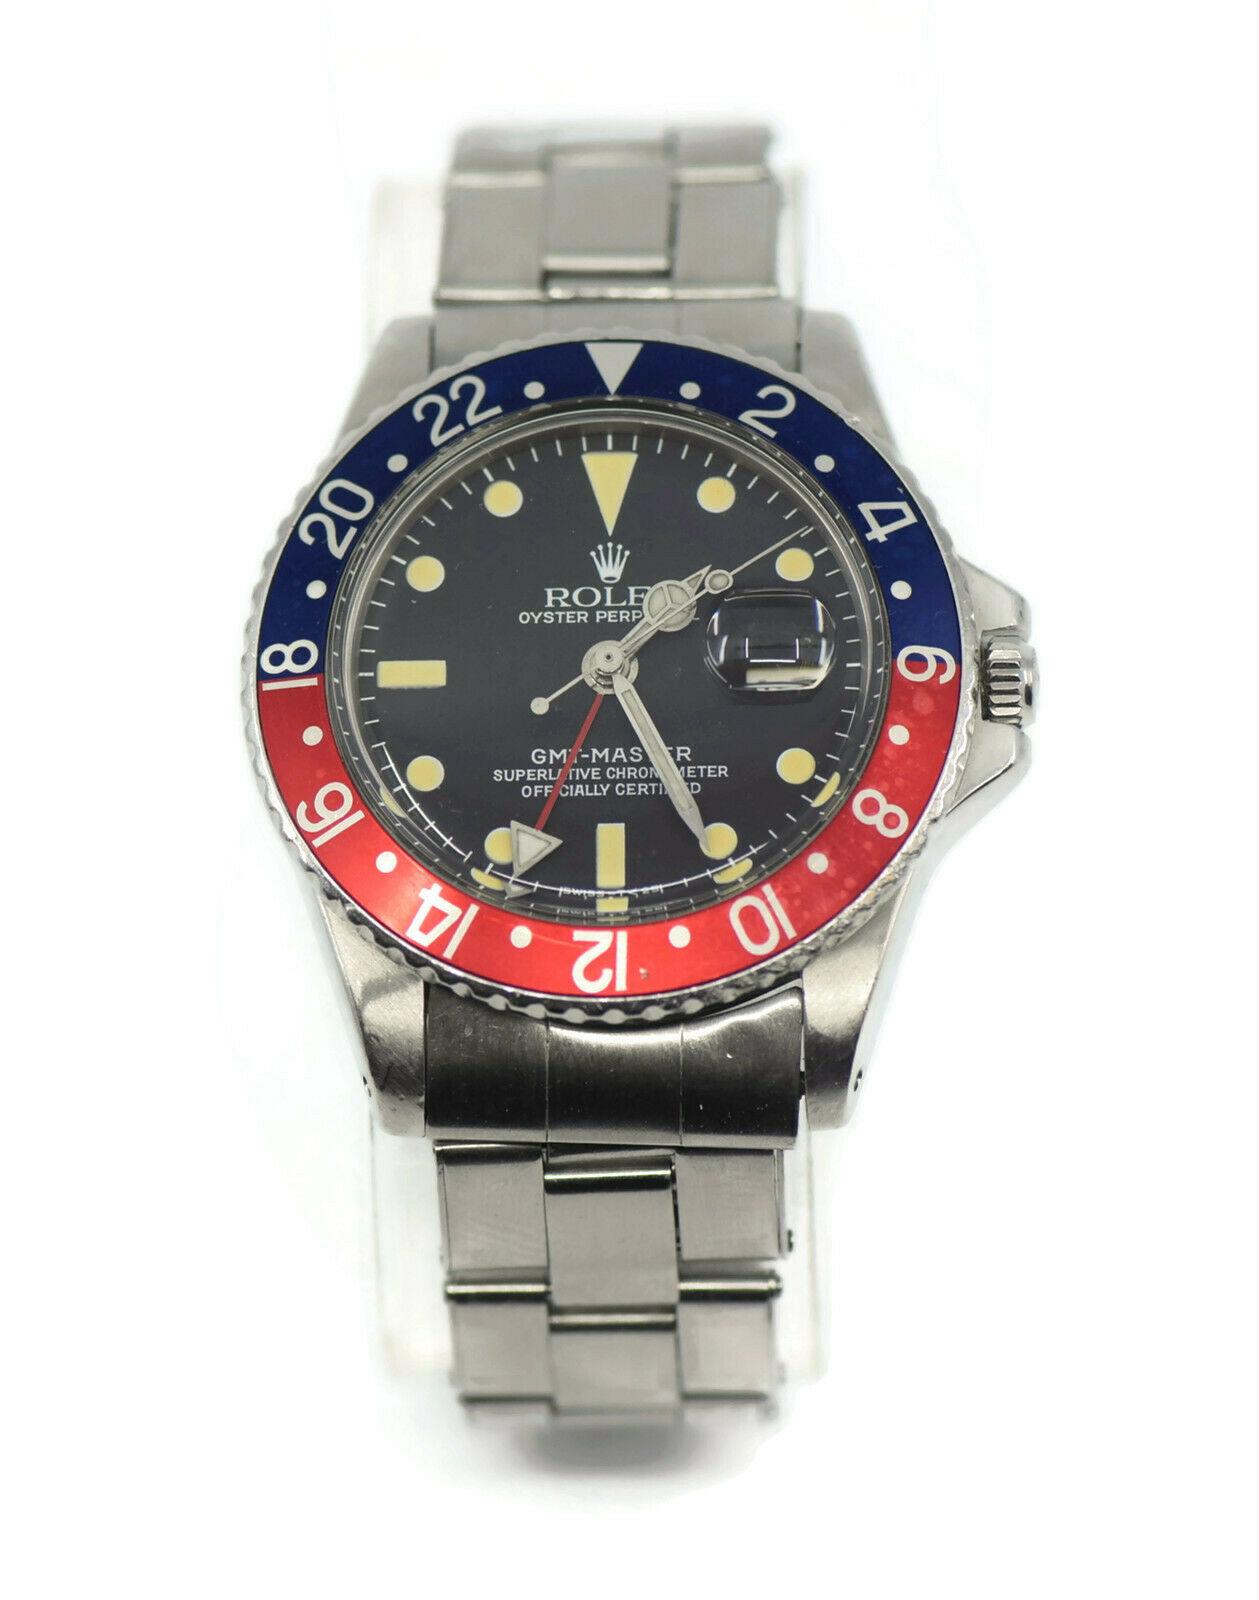 Rolex GMT,Master Pepsi Stainless Steel Watch 1675